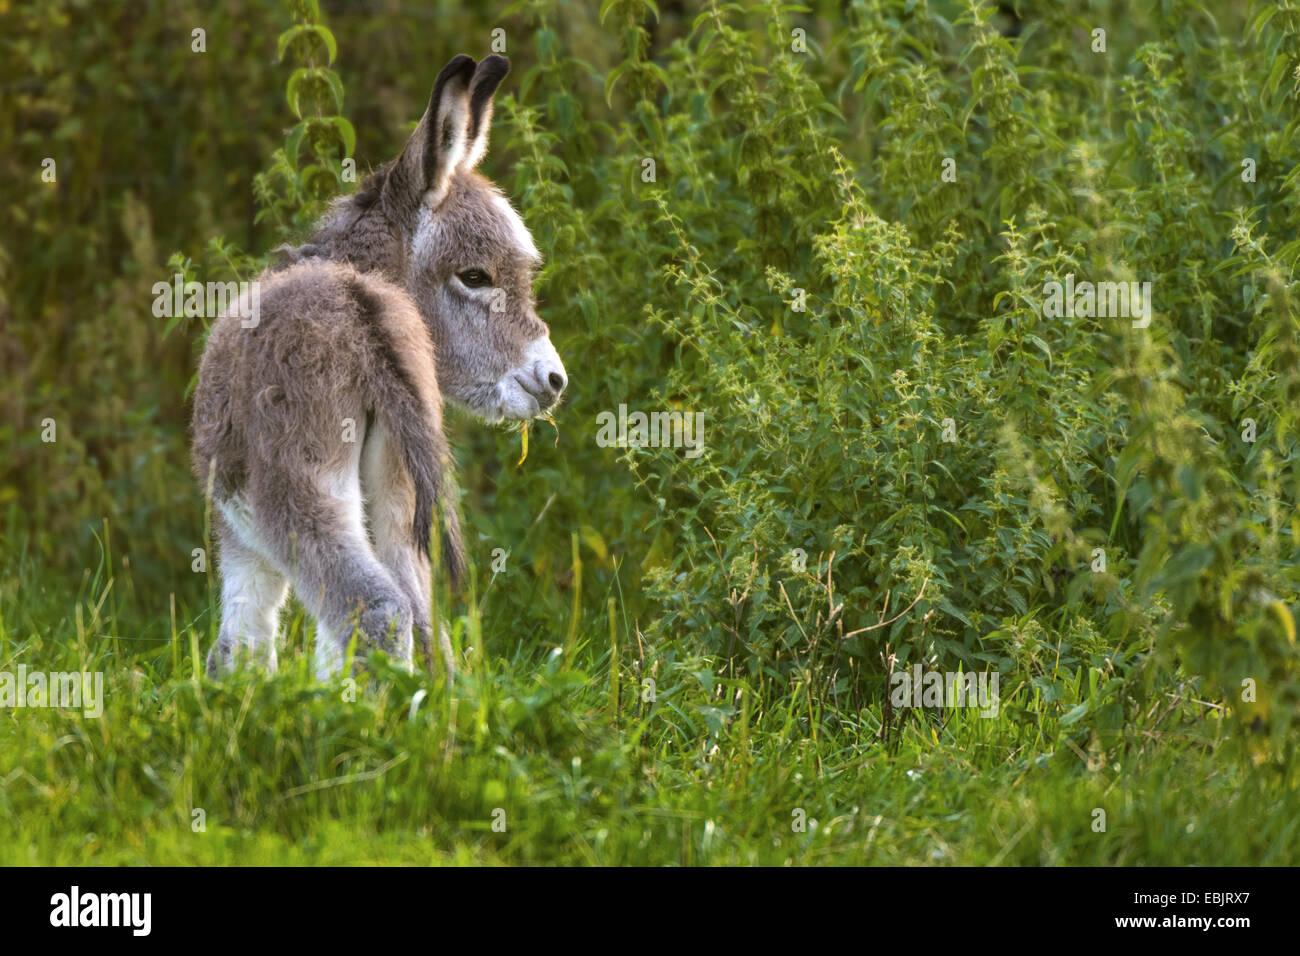 domestic donkey (Equus asinus f. asinus), donkey foal grazing near nettles, Germany, North Rhine-Westphalia Stock Photo